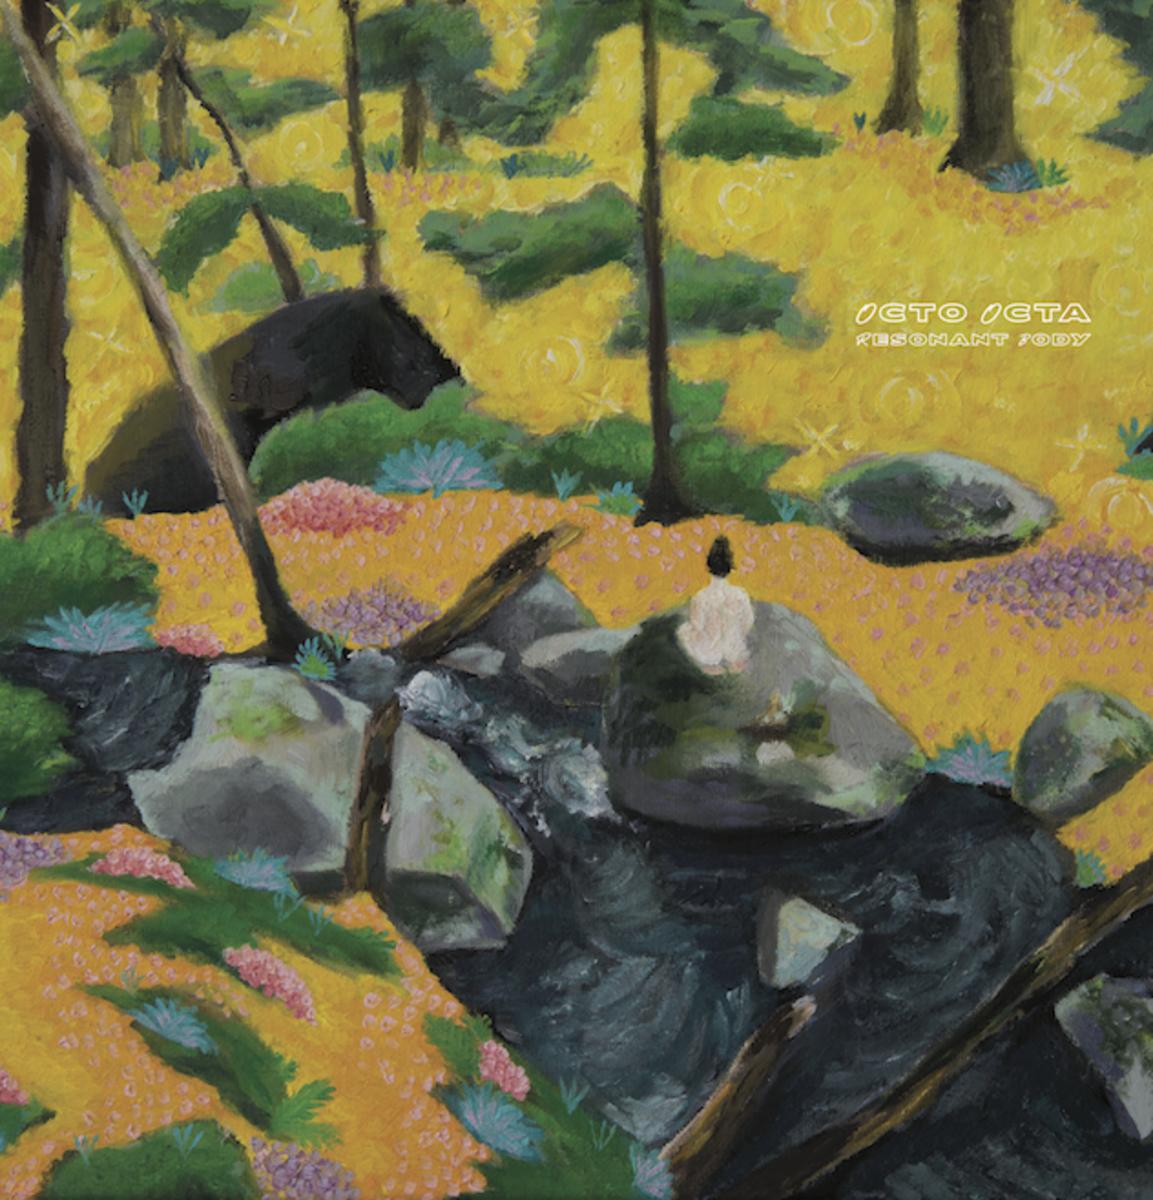 Octo Octa Resonant Body Album Cover Art